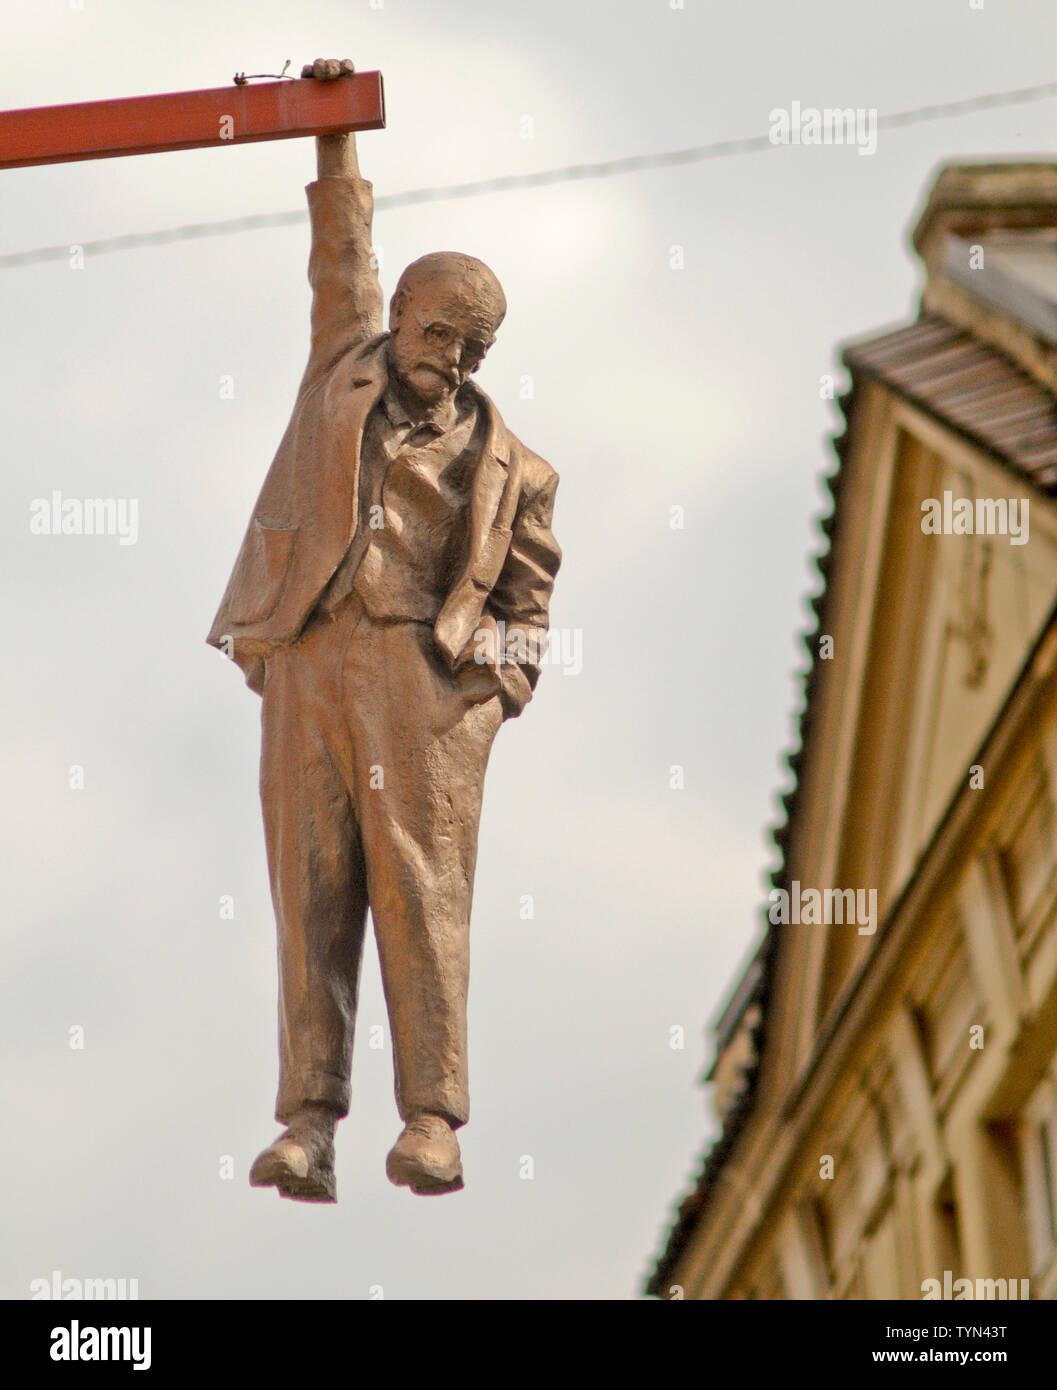 Sigmund Freud hanging figure ('Man Hanging Out'), by David Černý, Prague, Czech Republic - Stock Image